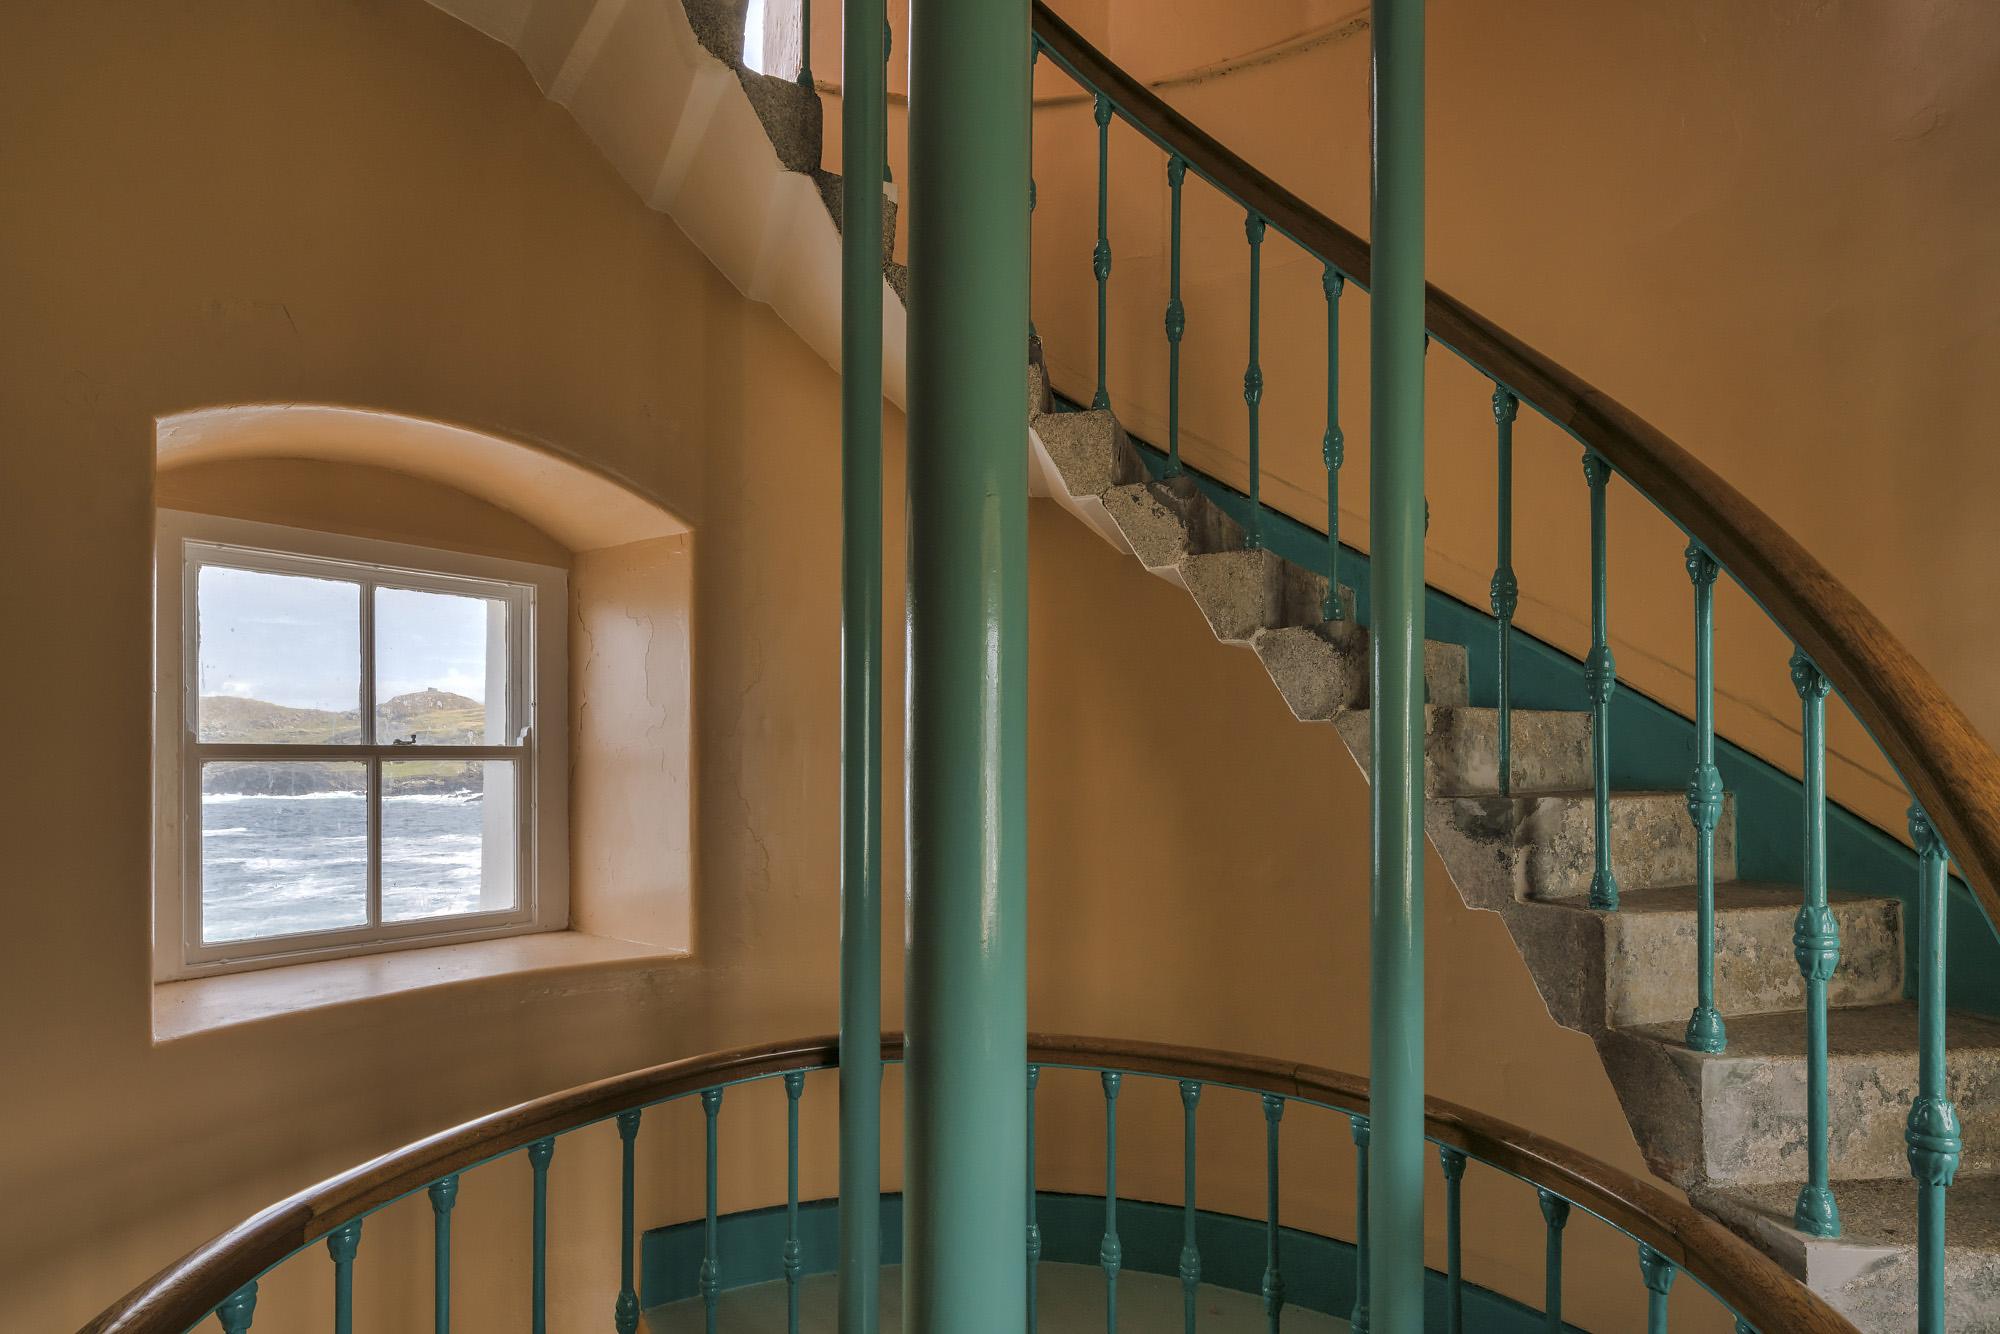 Valentia Lighthouse, County Kerry, Ireland. Sony A7R II, Canon TS-E17mm f/4 L, ISO 100, 1/25s at f/16. Tripod. Aug. © Carsten Krieger